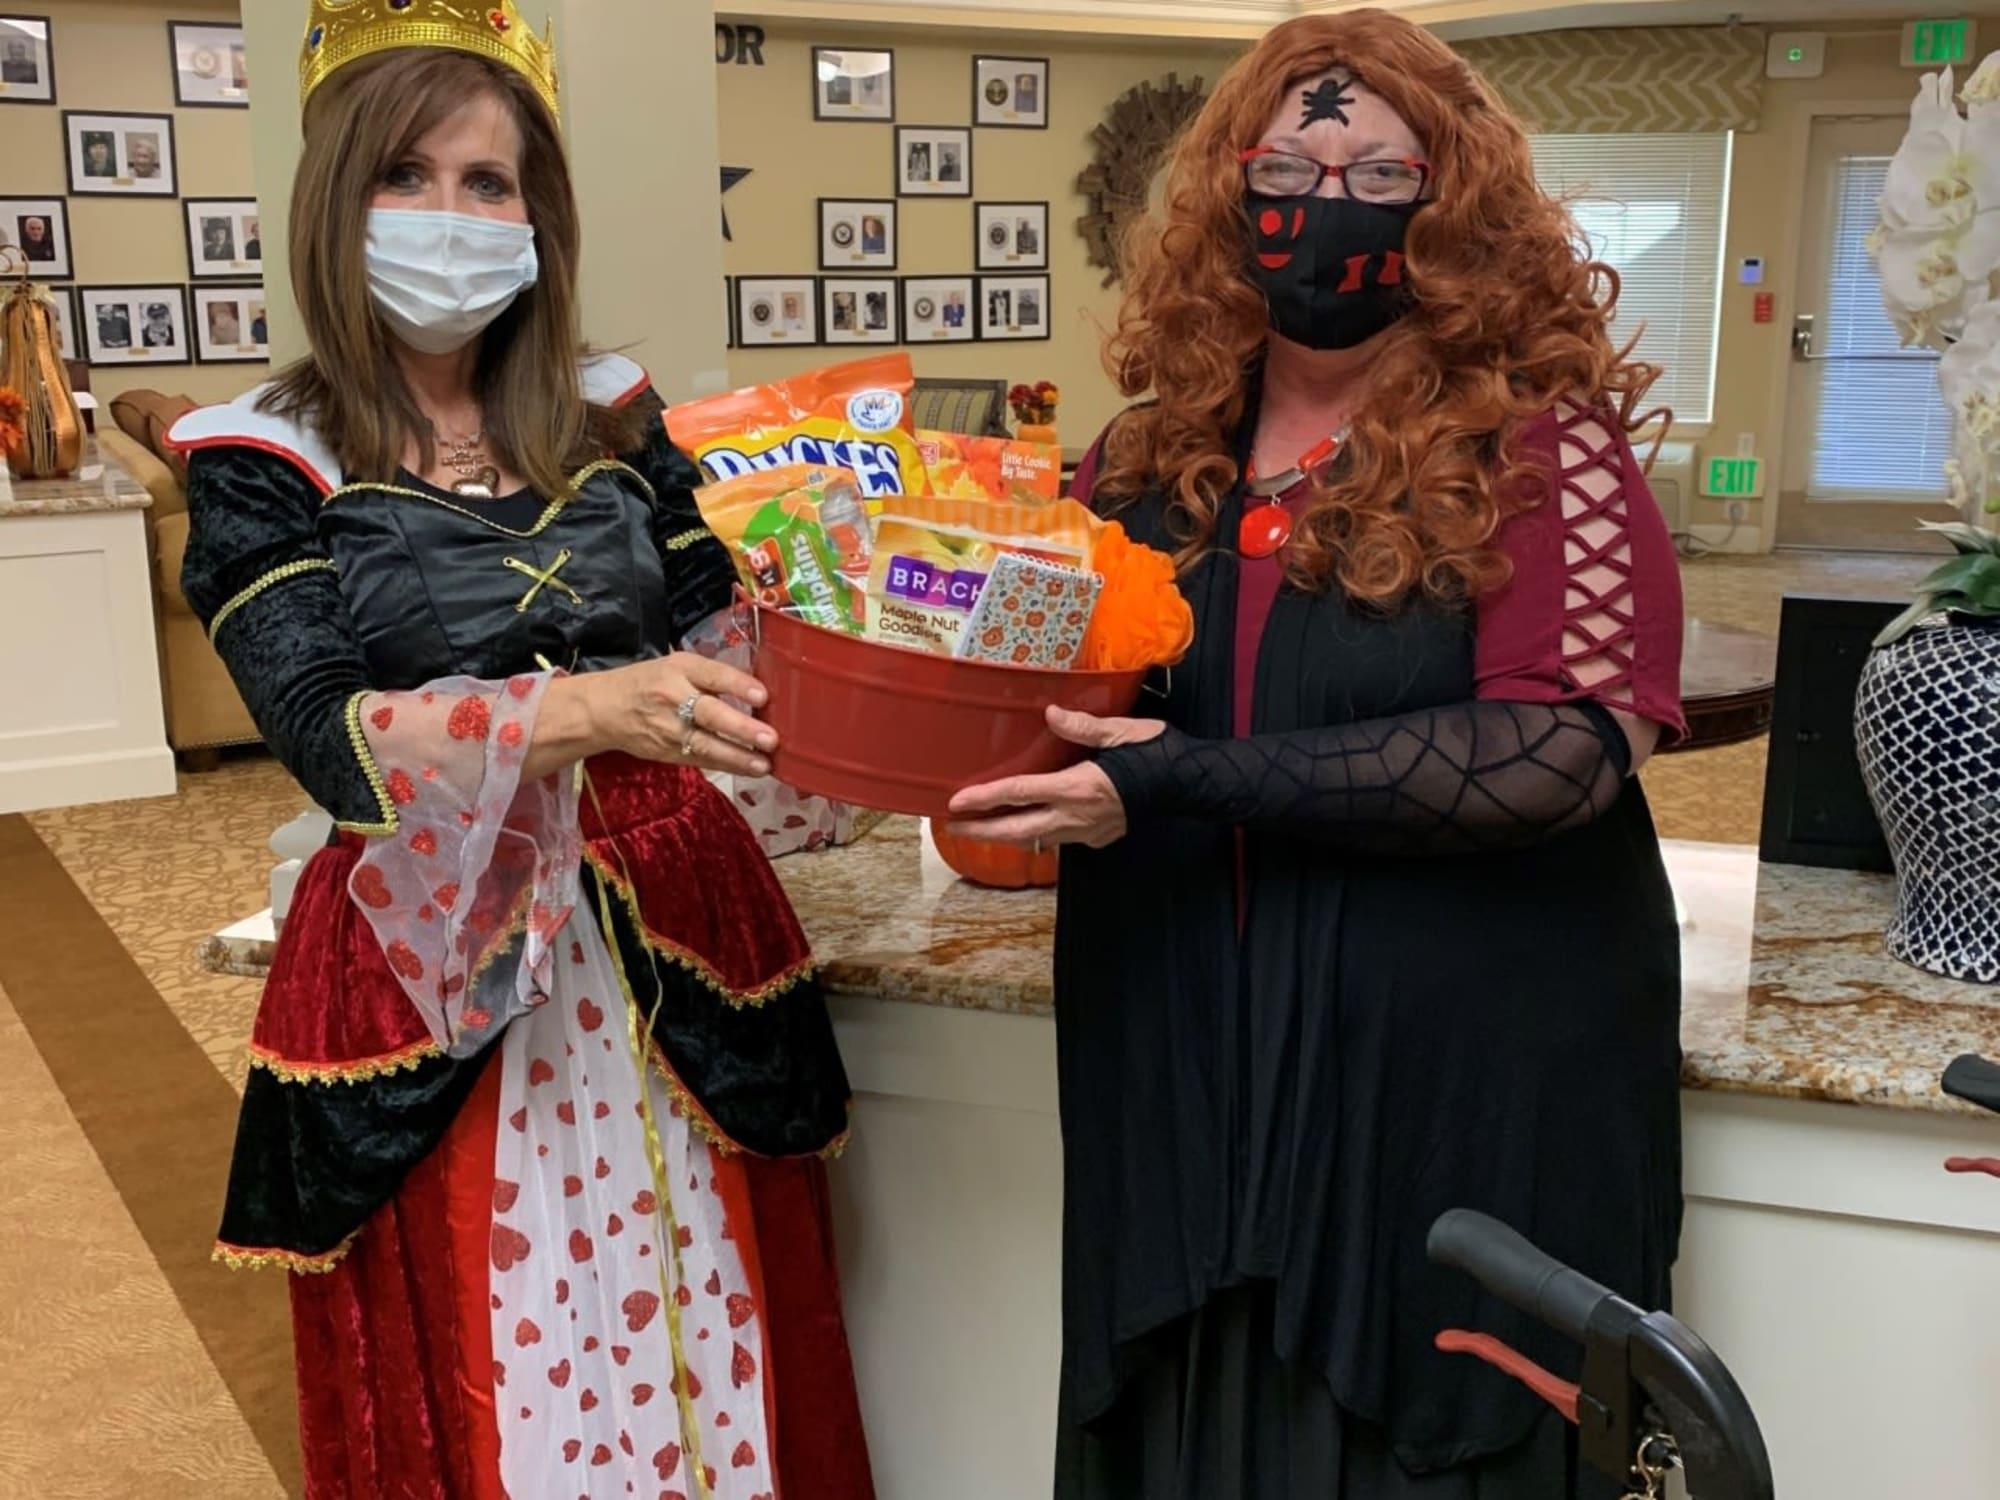 Halloween at The Commons on Thornton in Stockton, California